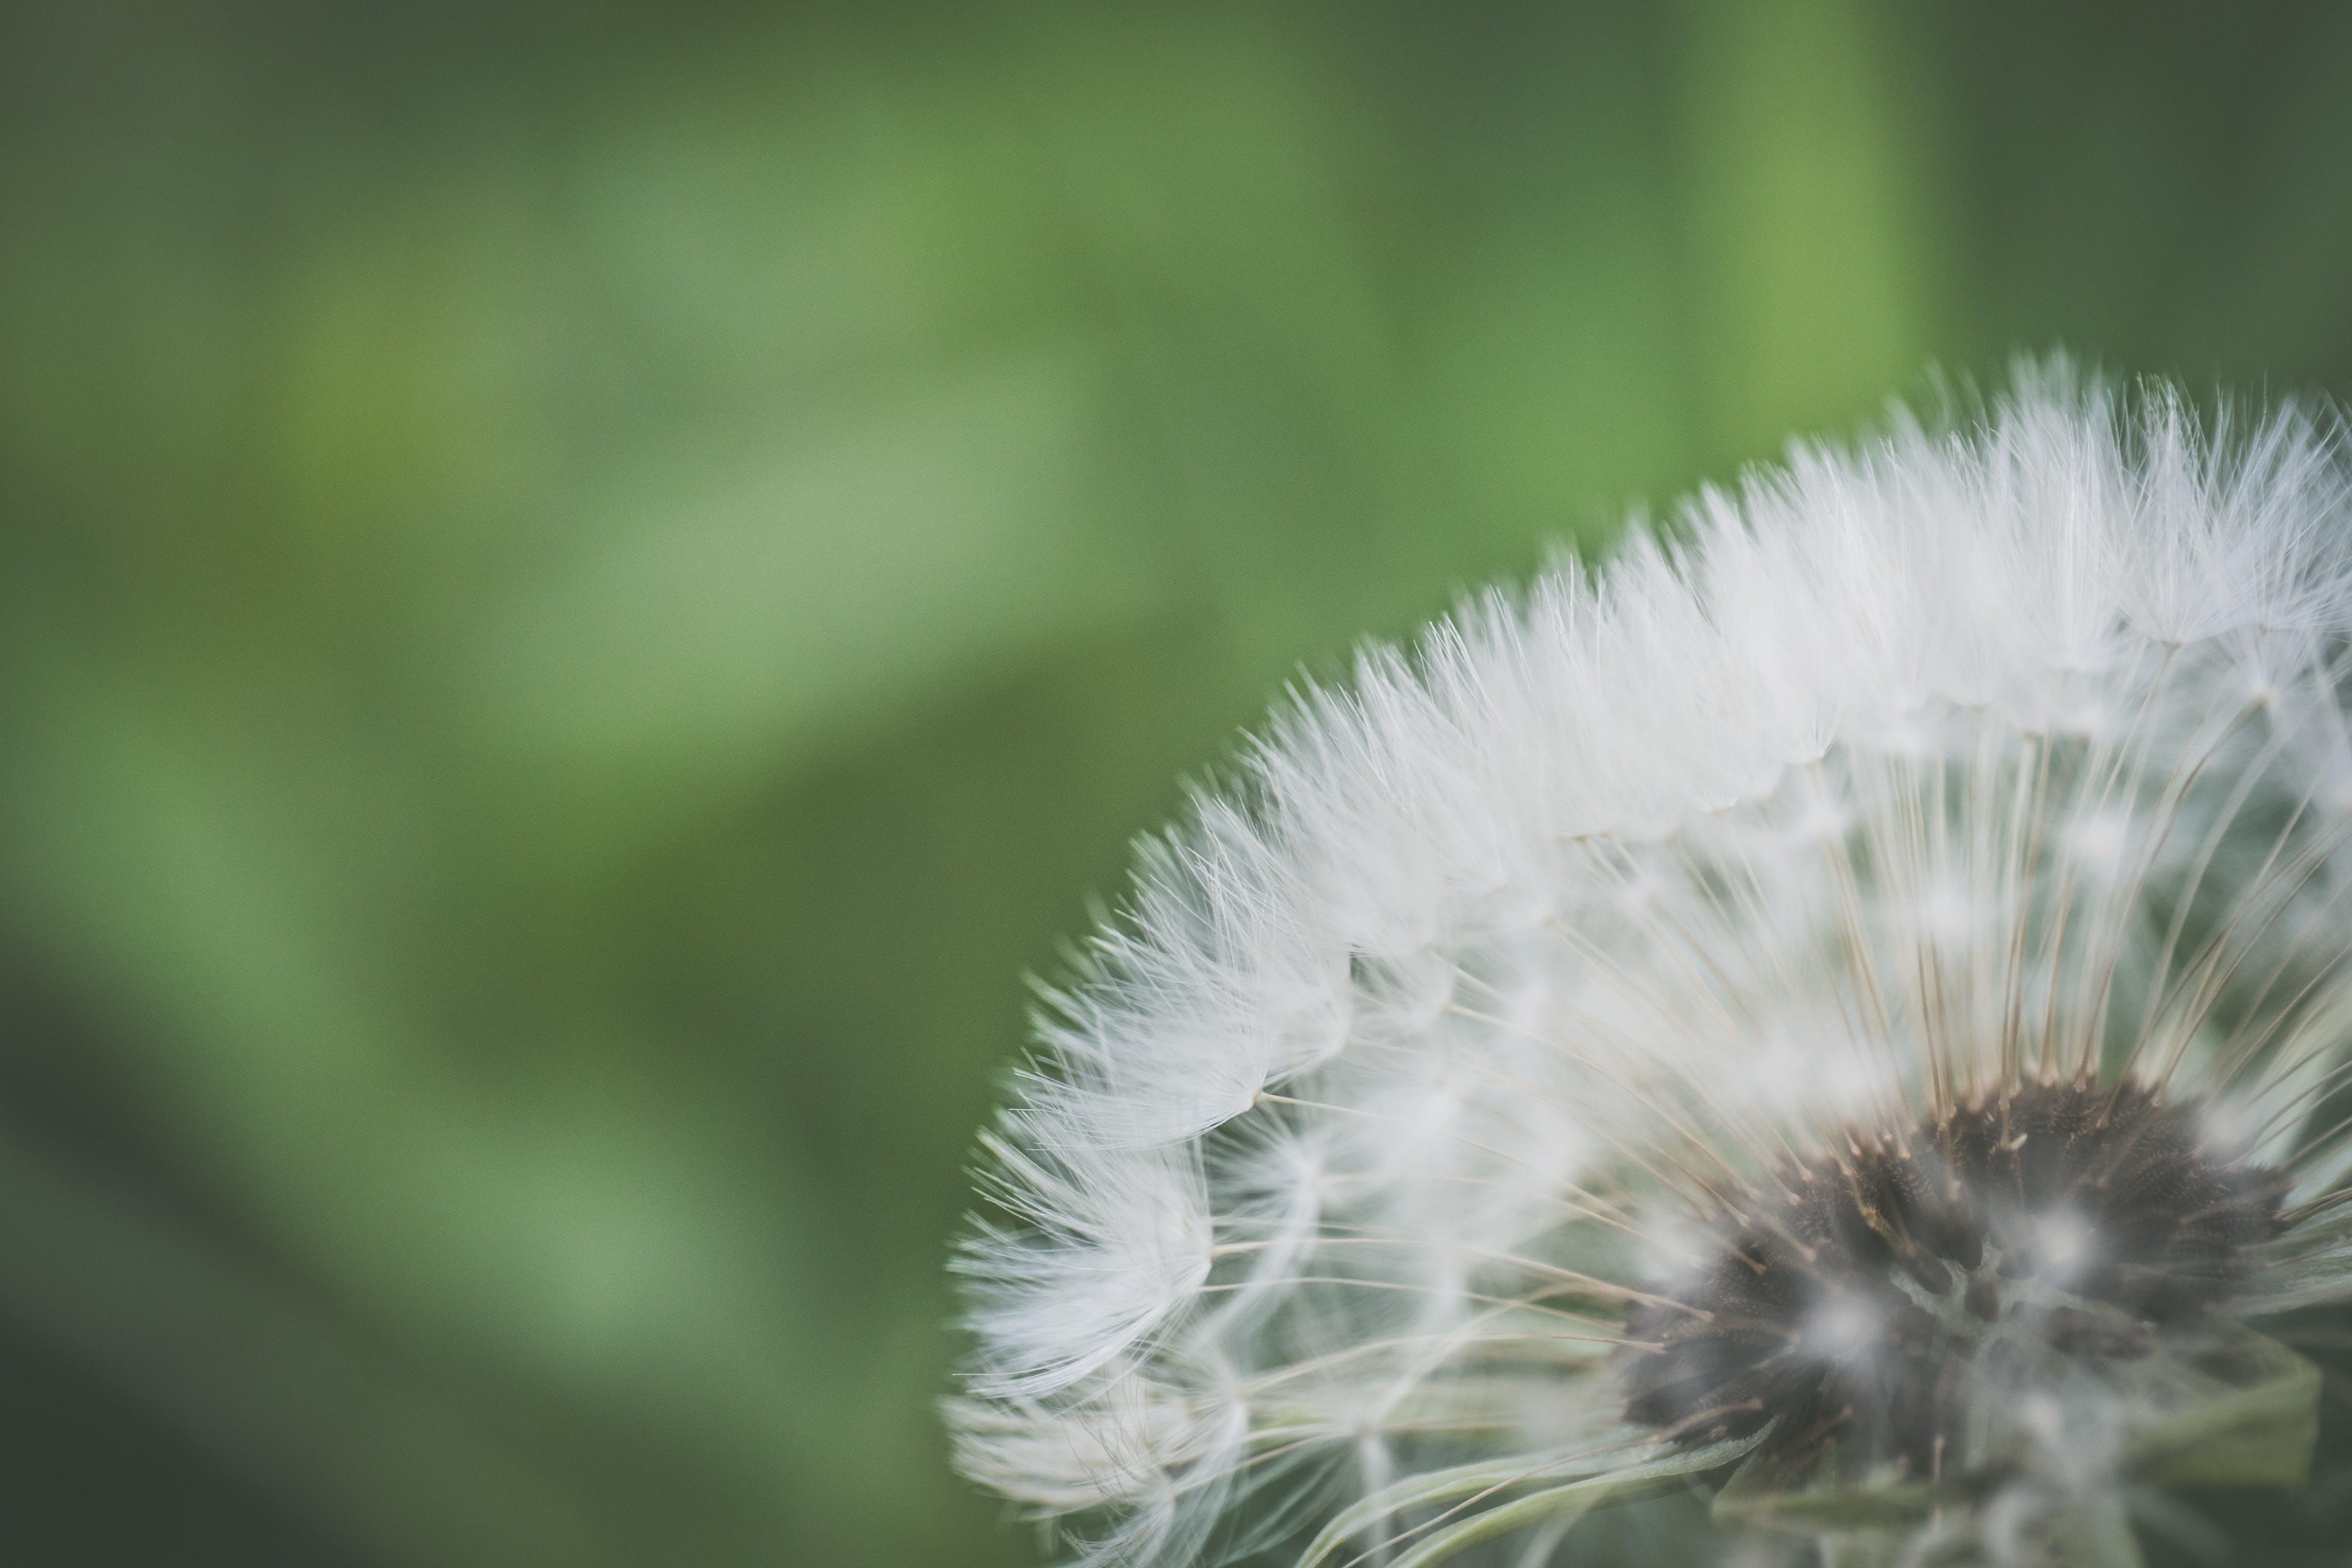 Close Up Photo of White Dandelion